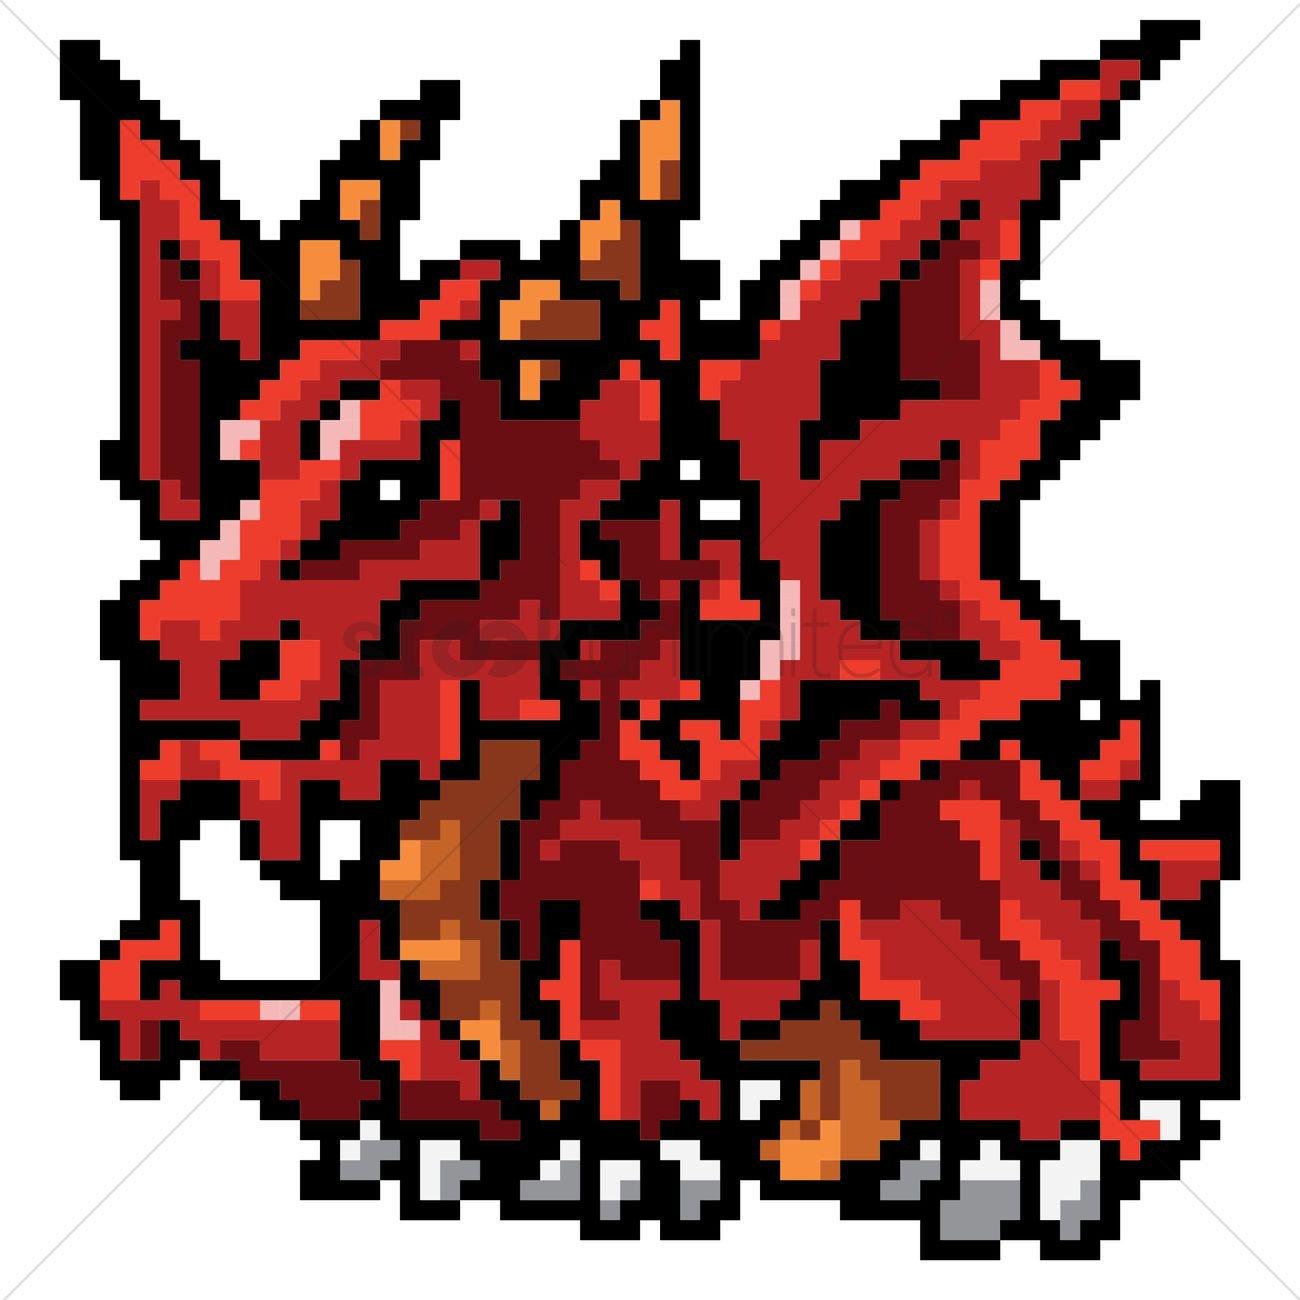 Dragon Pixel Art Grid Pixel Art Mythical Dragon Vector Image